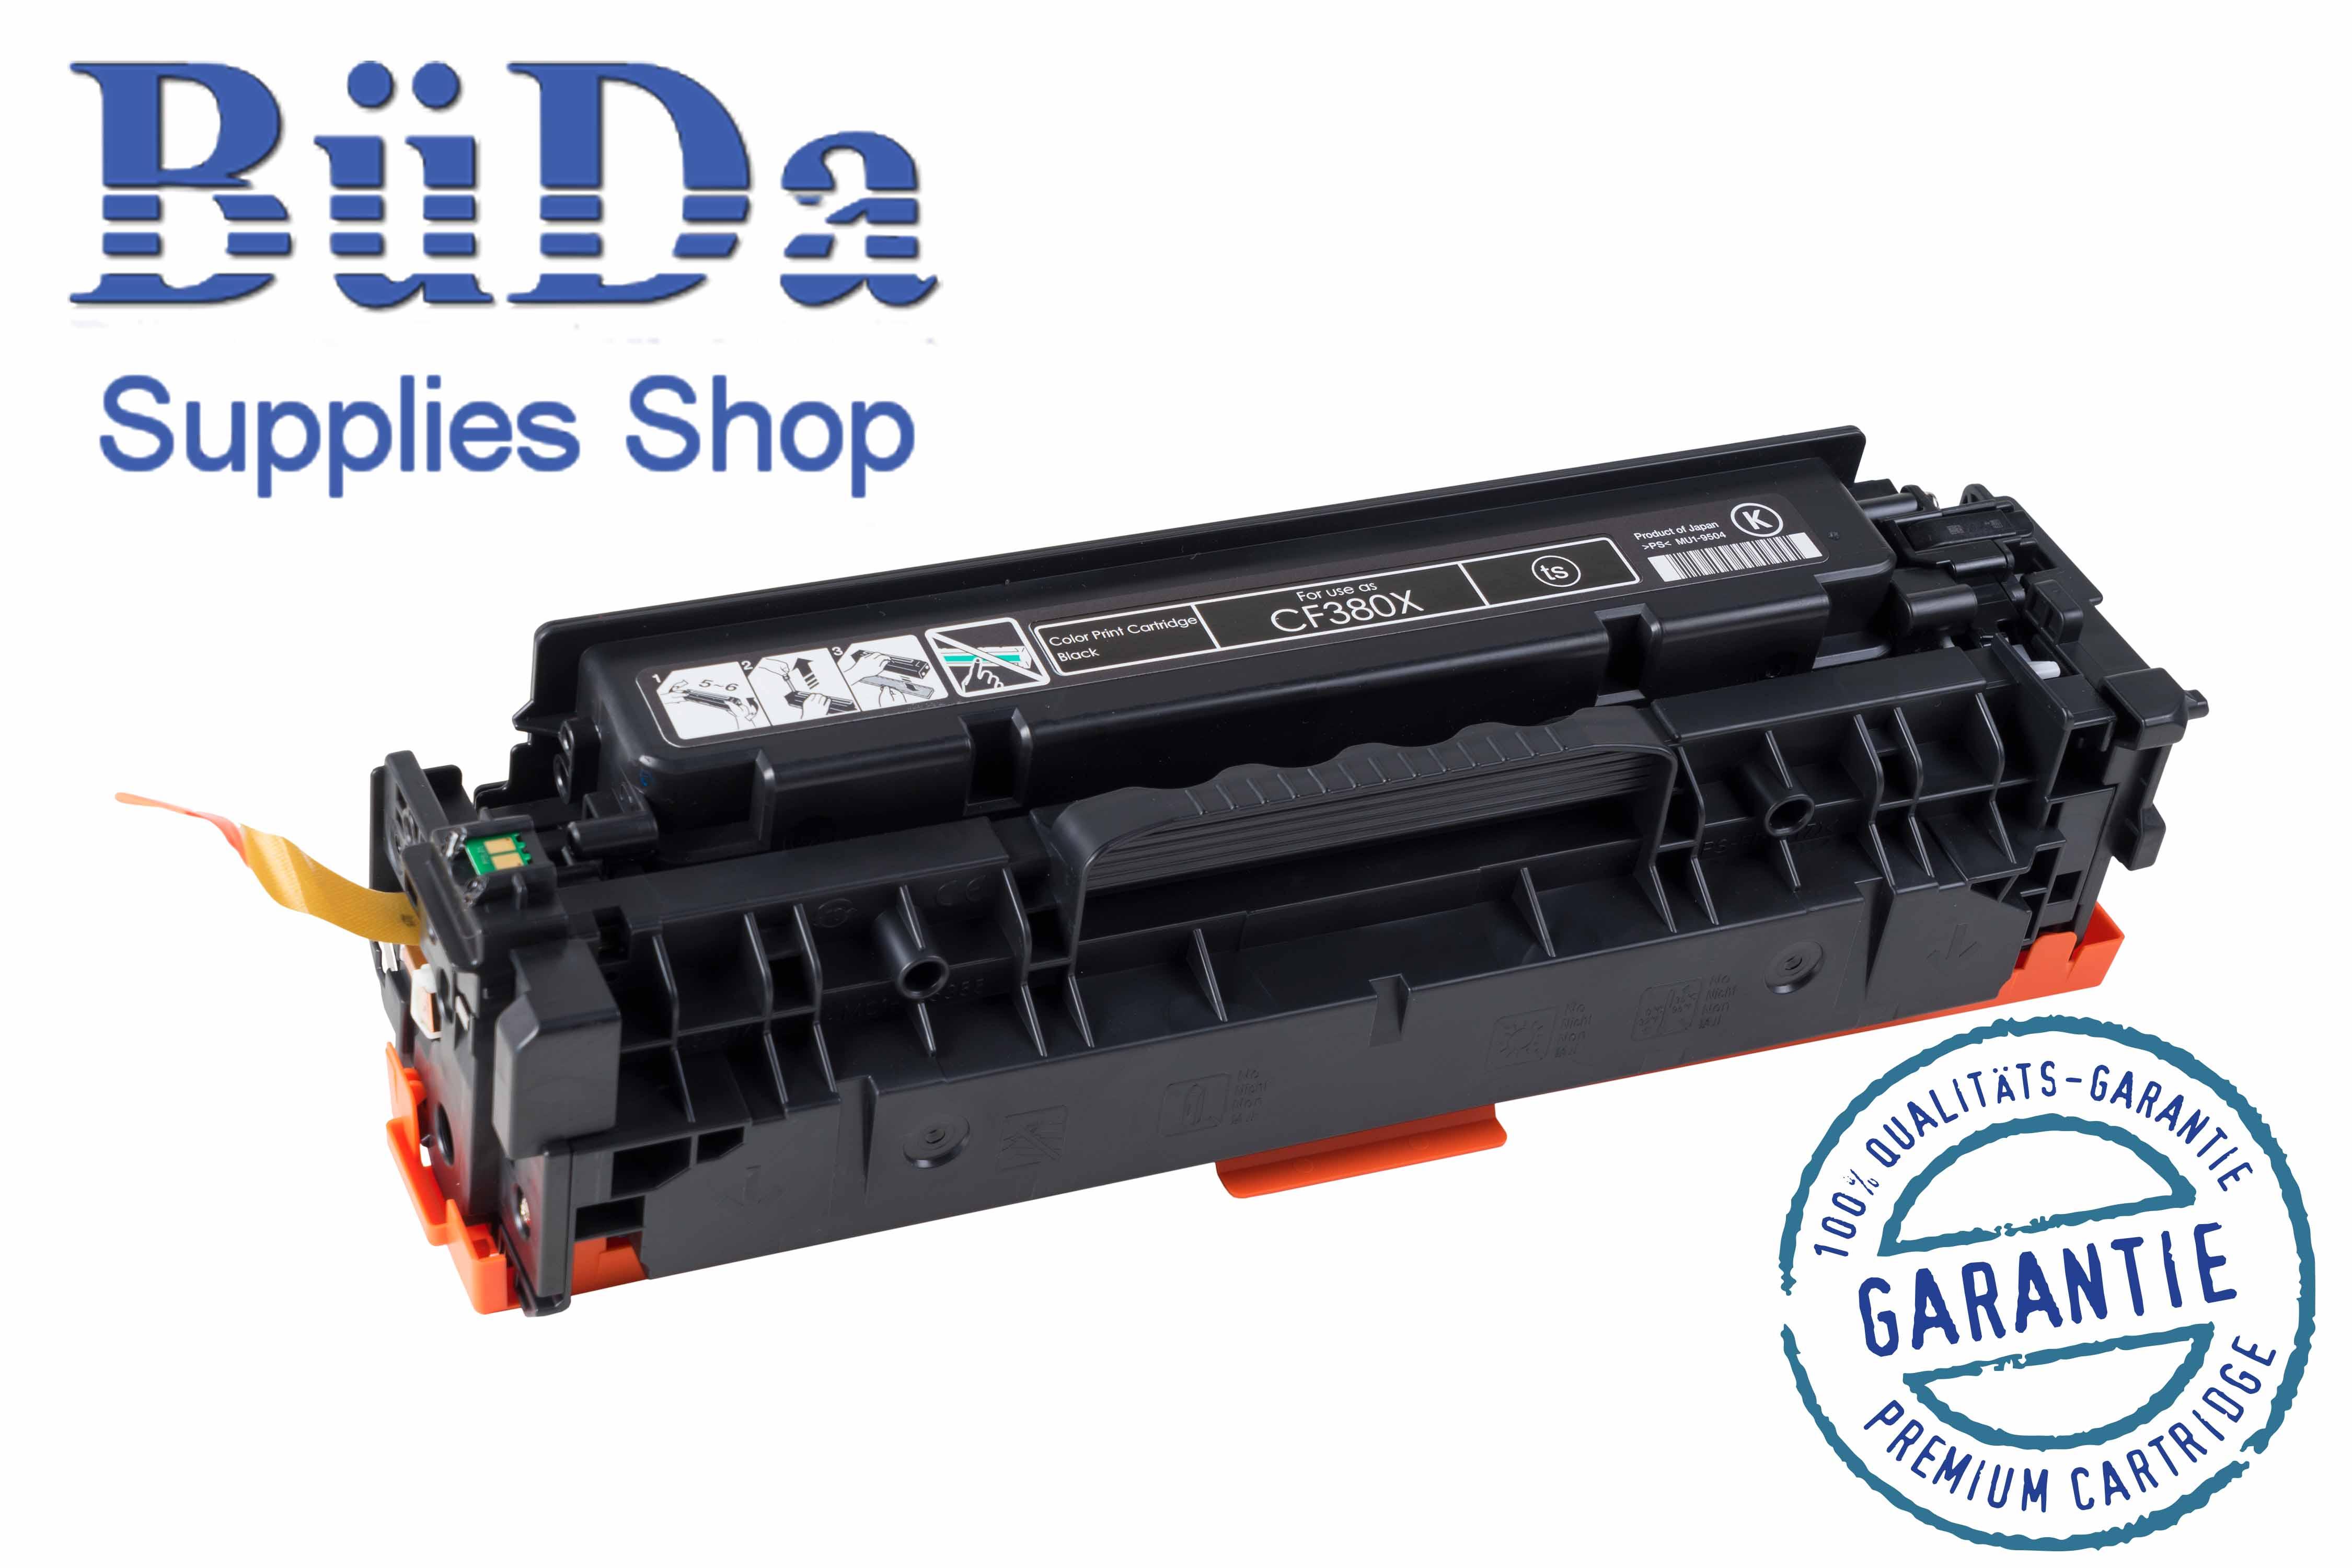 Toner-Modul komp. zu CF380X / 312X black 4400 Seiten